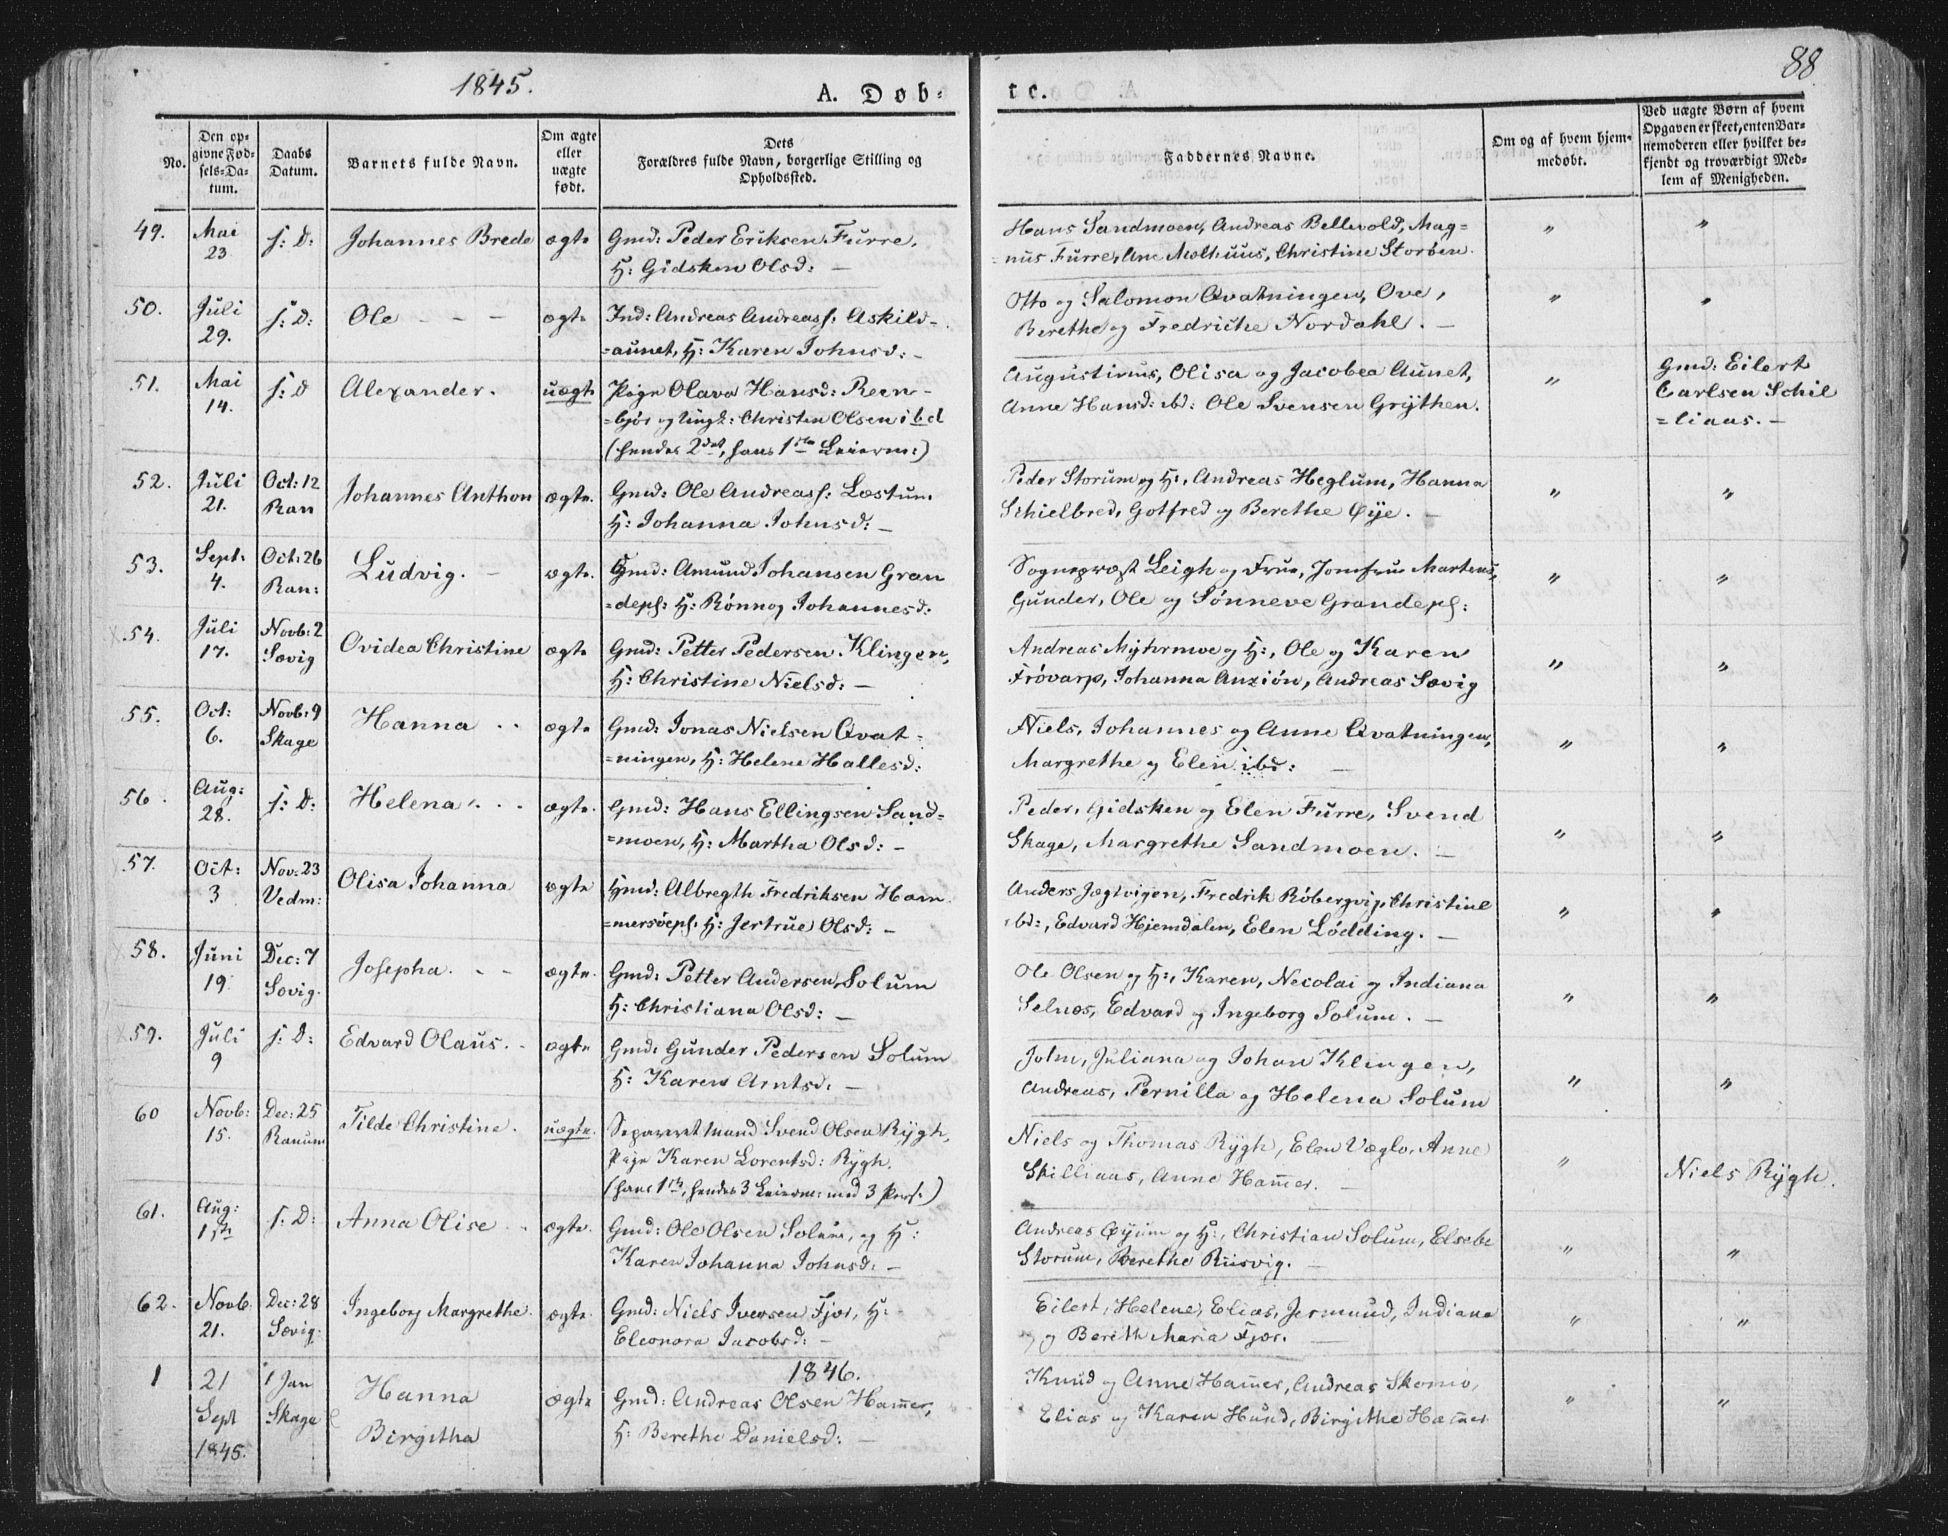 SAT, Ministerialprotokoller, klokkerbøker og fødselsregistre - Nord-Trøndelag, 764/L0551: Ministerialbok nr. 764A07a, 1824-1864, s. 88